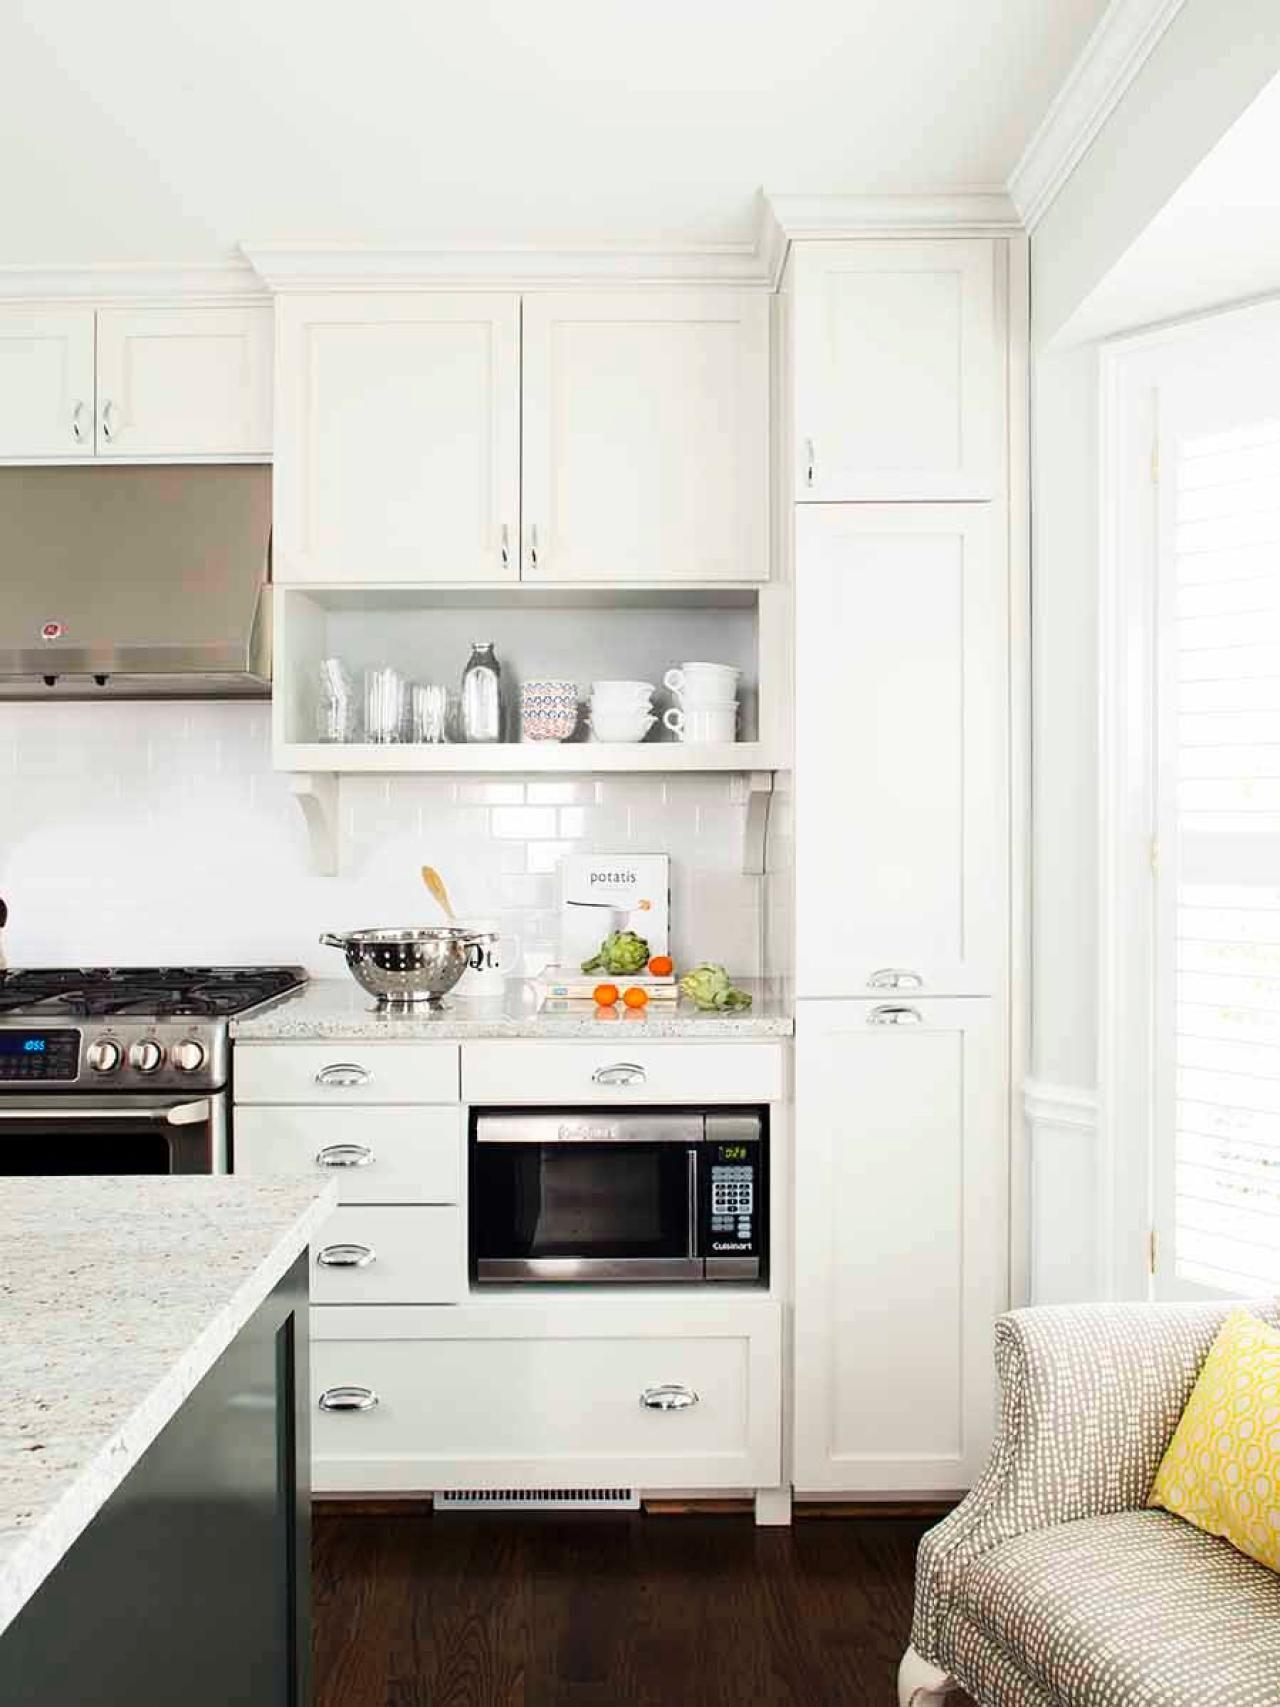 Best A Bright White Kitchen With A White Subway Tile Backsplash 400 x 300